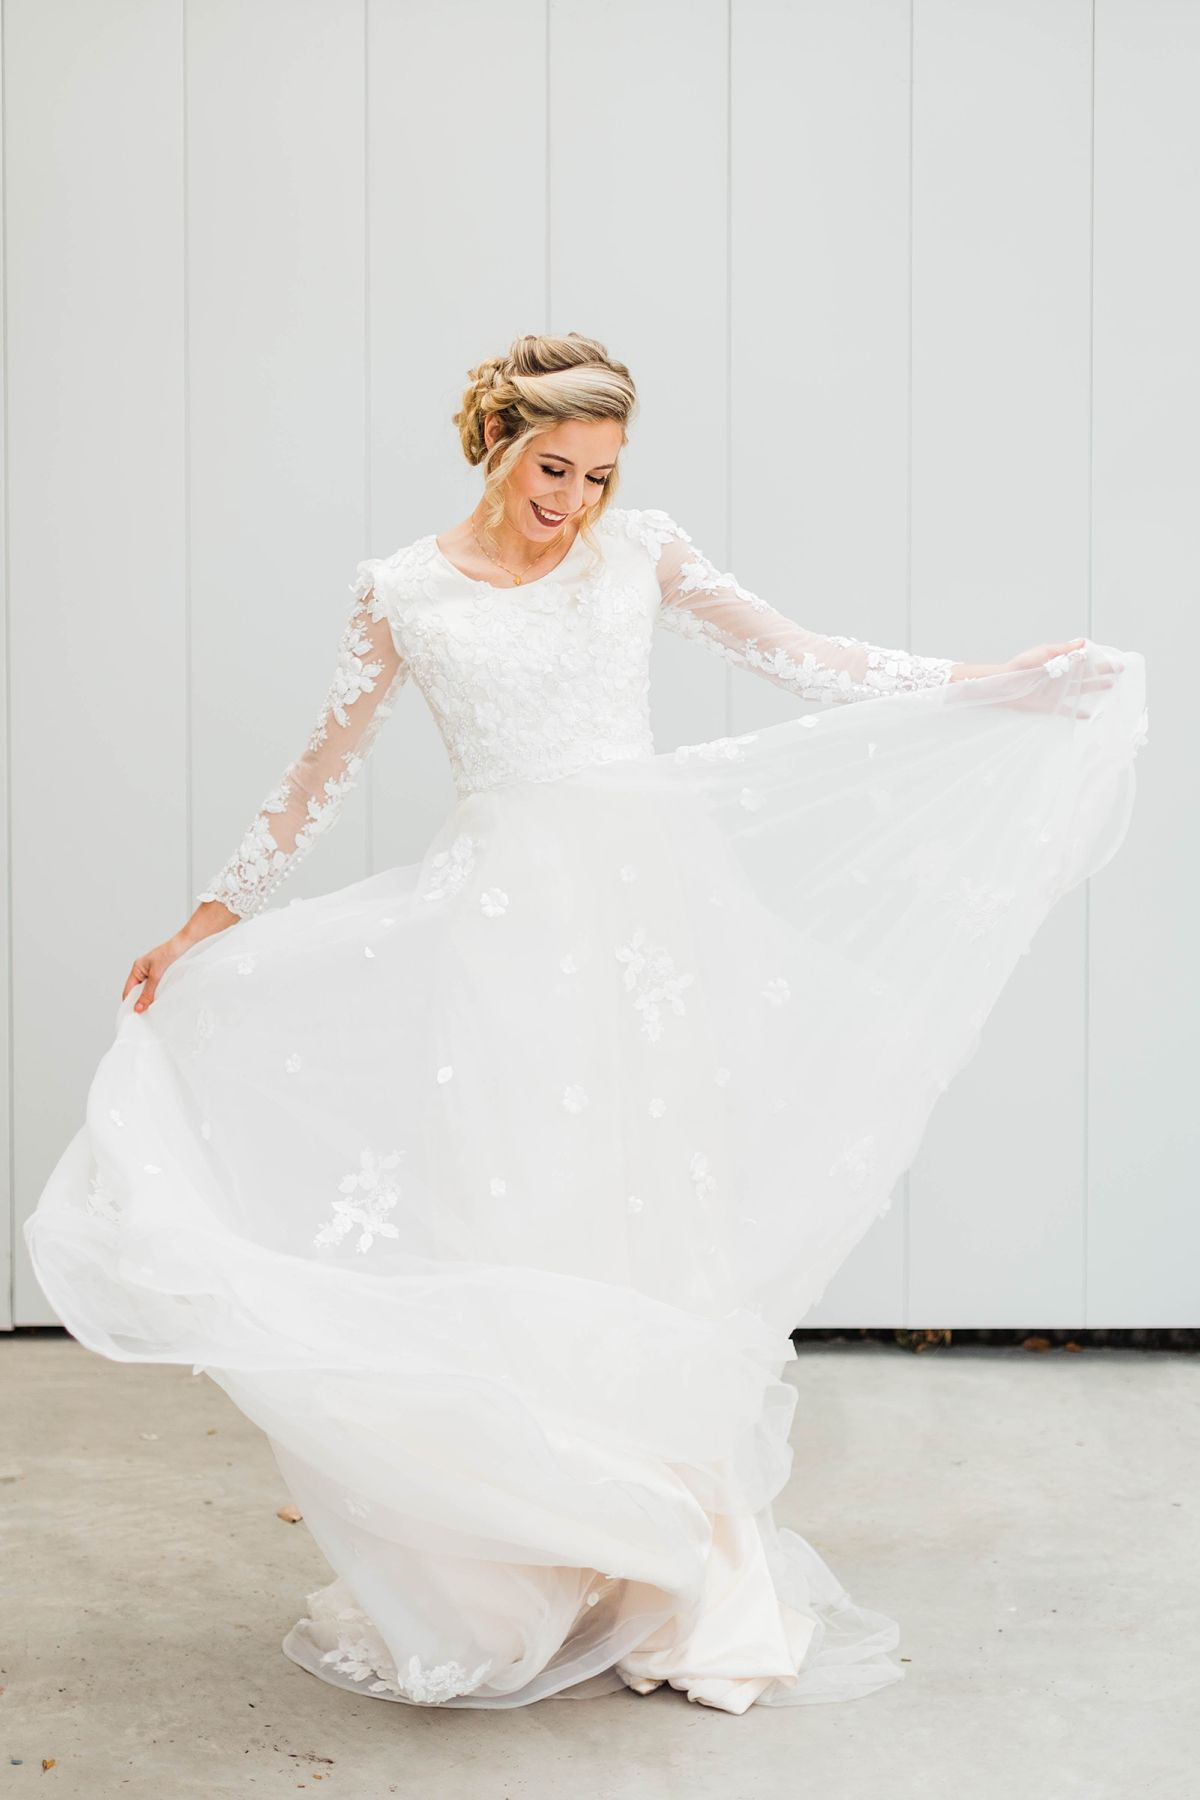 Springtime Wedding Inspiration At Shade Home And Garden Orem Utah Modest Wedding Dresses Wedding Dress Photography Utah Wedding Photographers